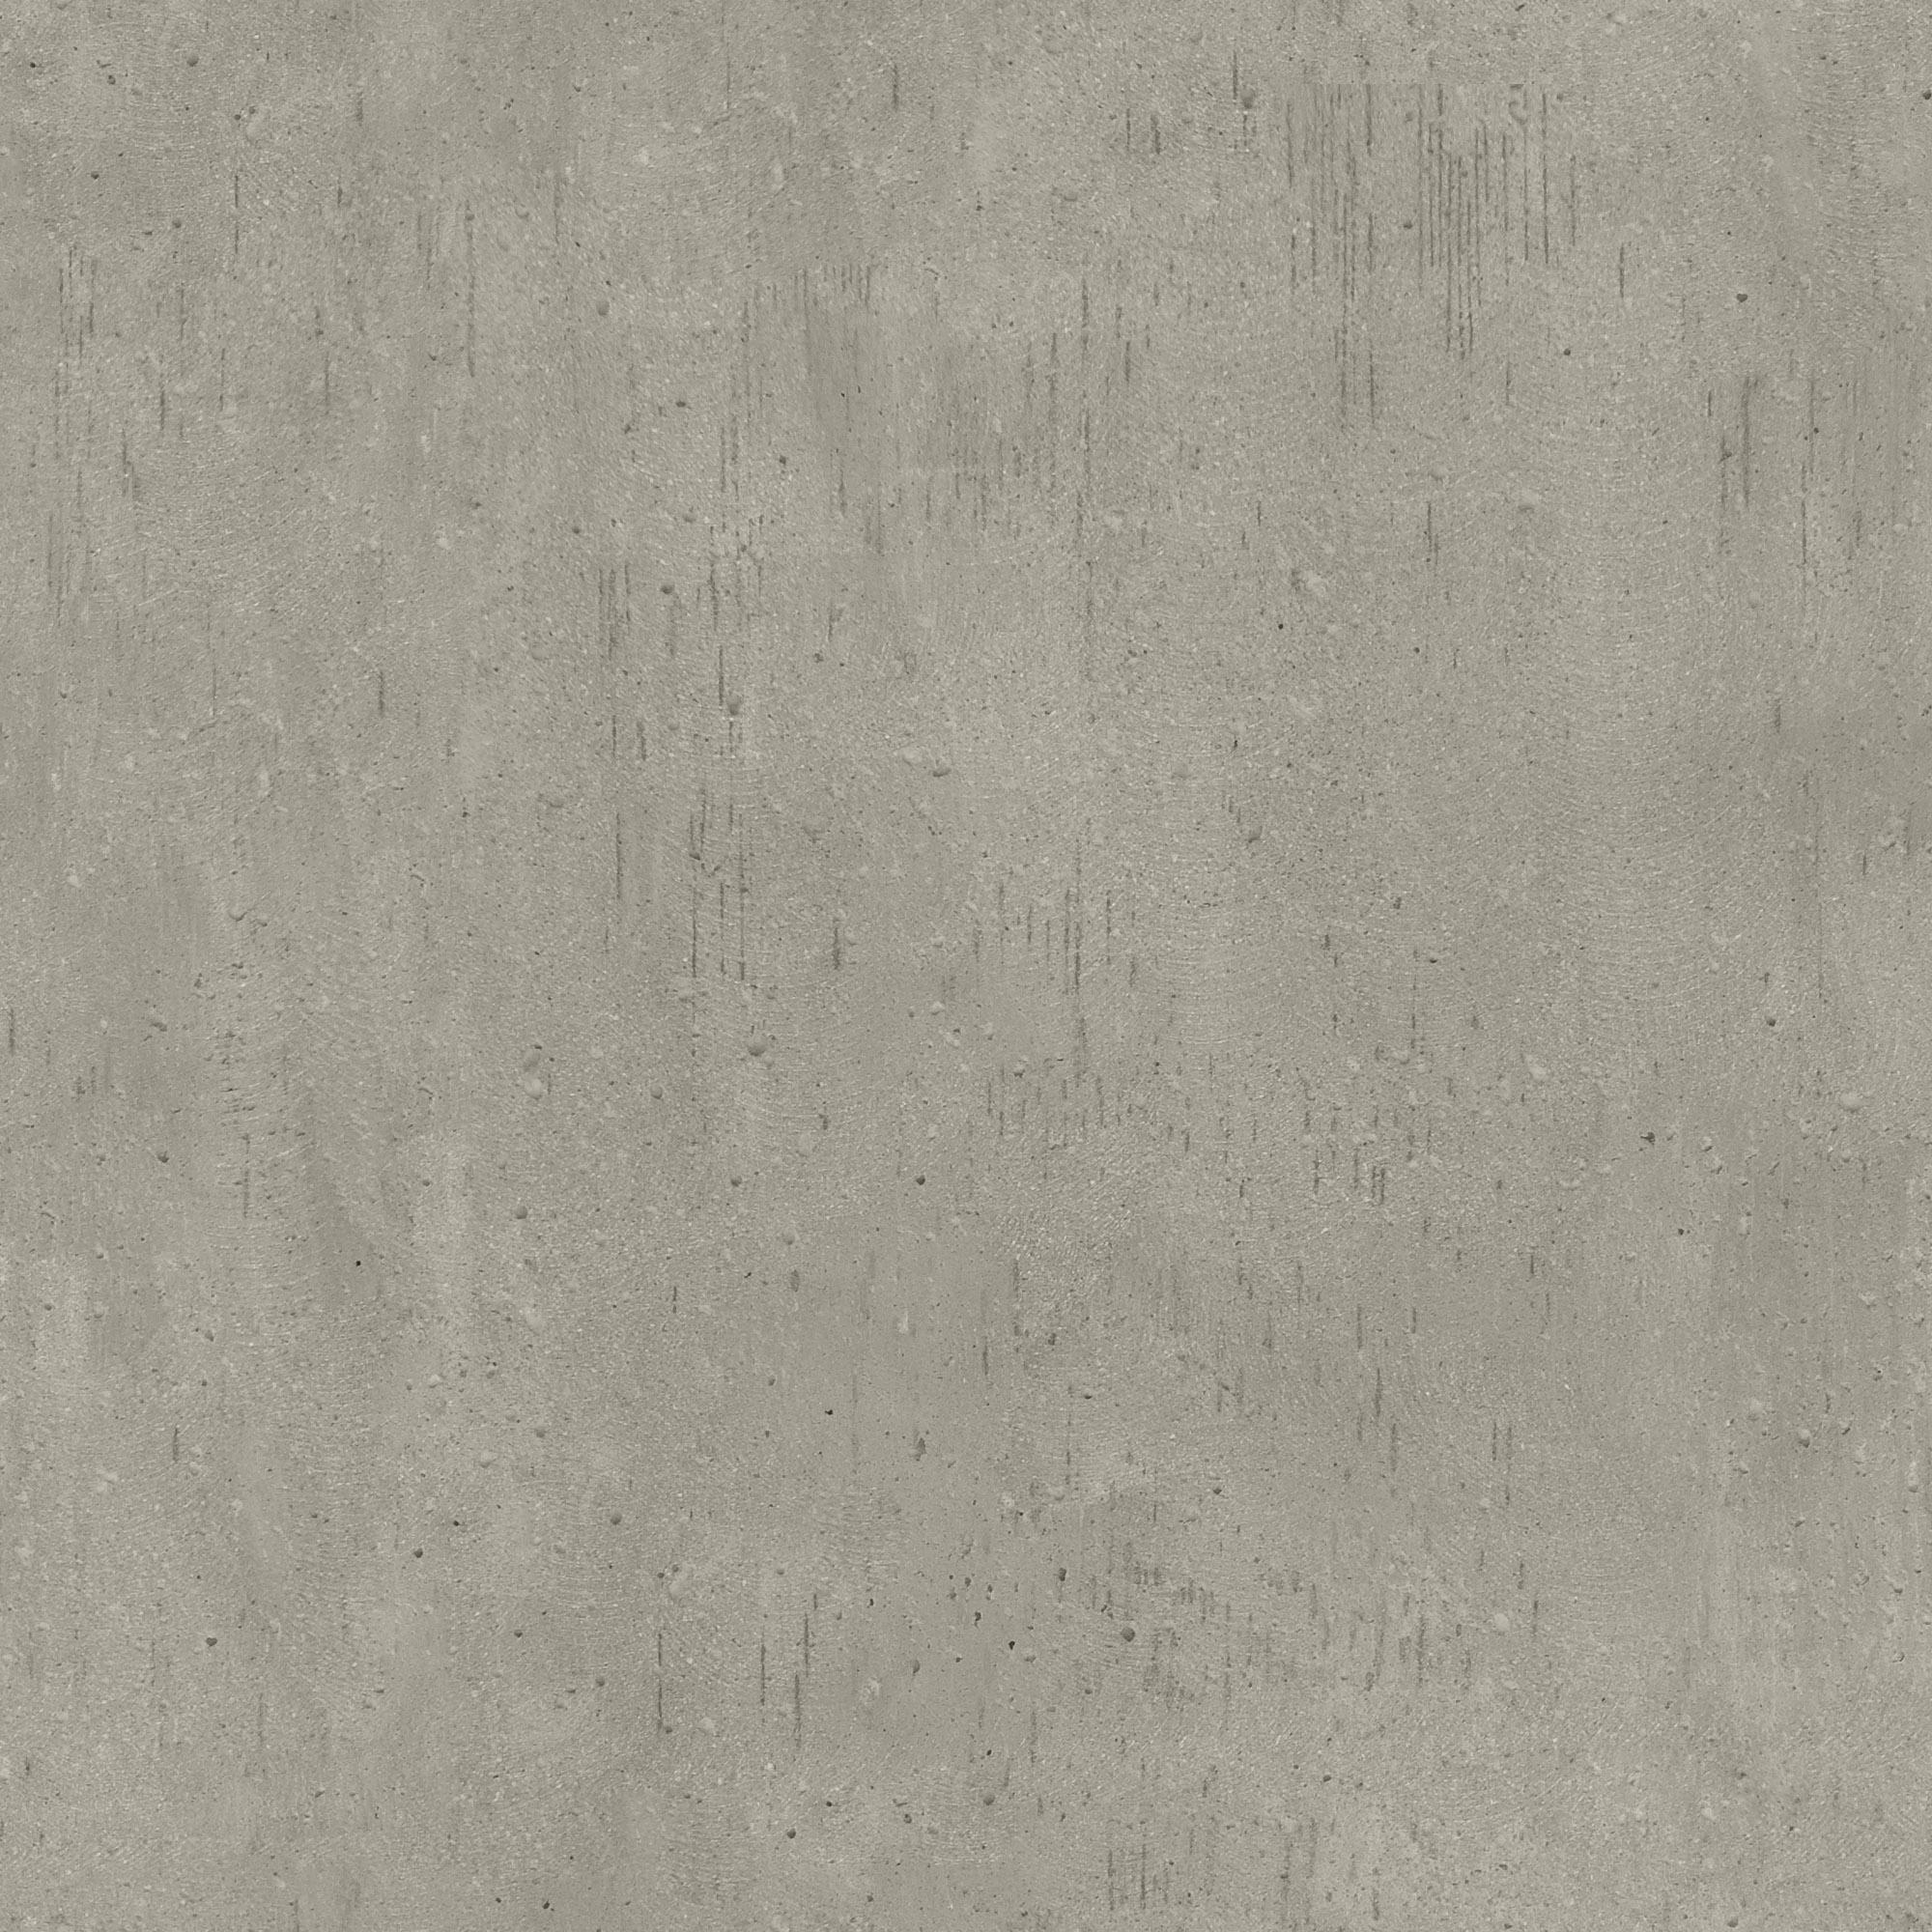 PolygonBlog » Seamless Texture